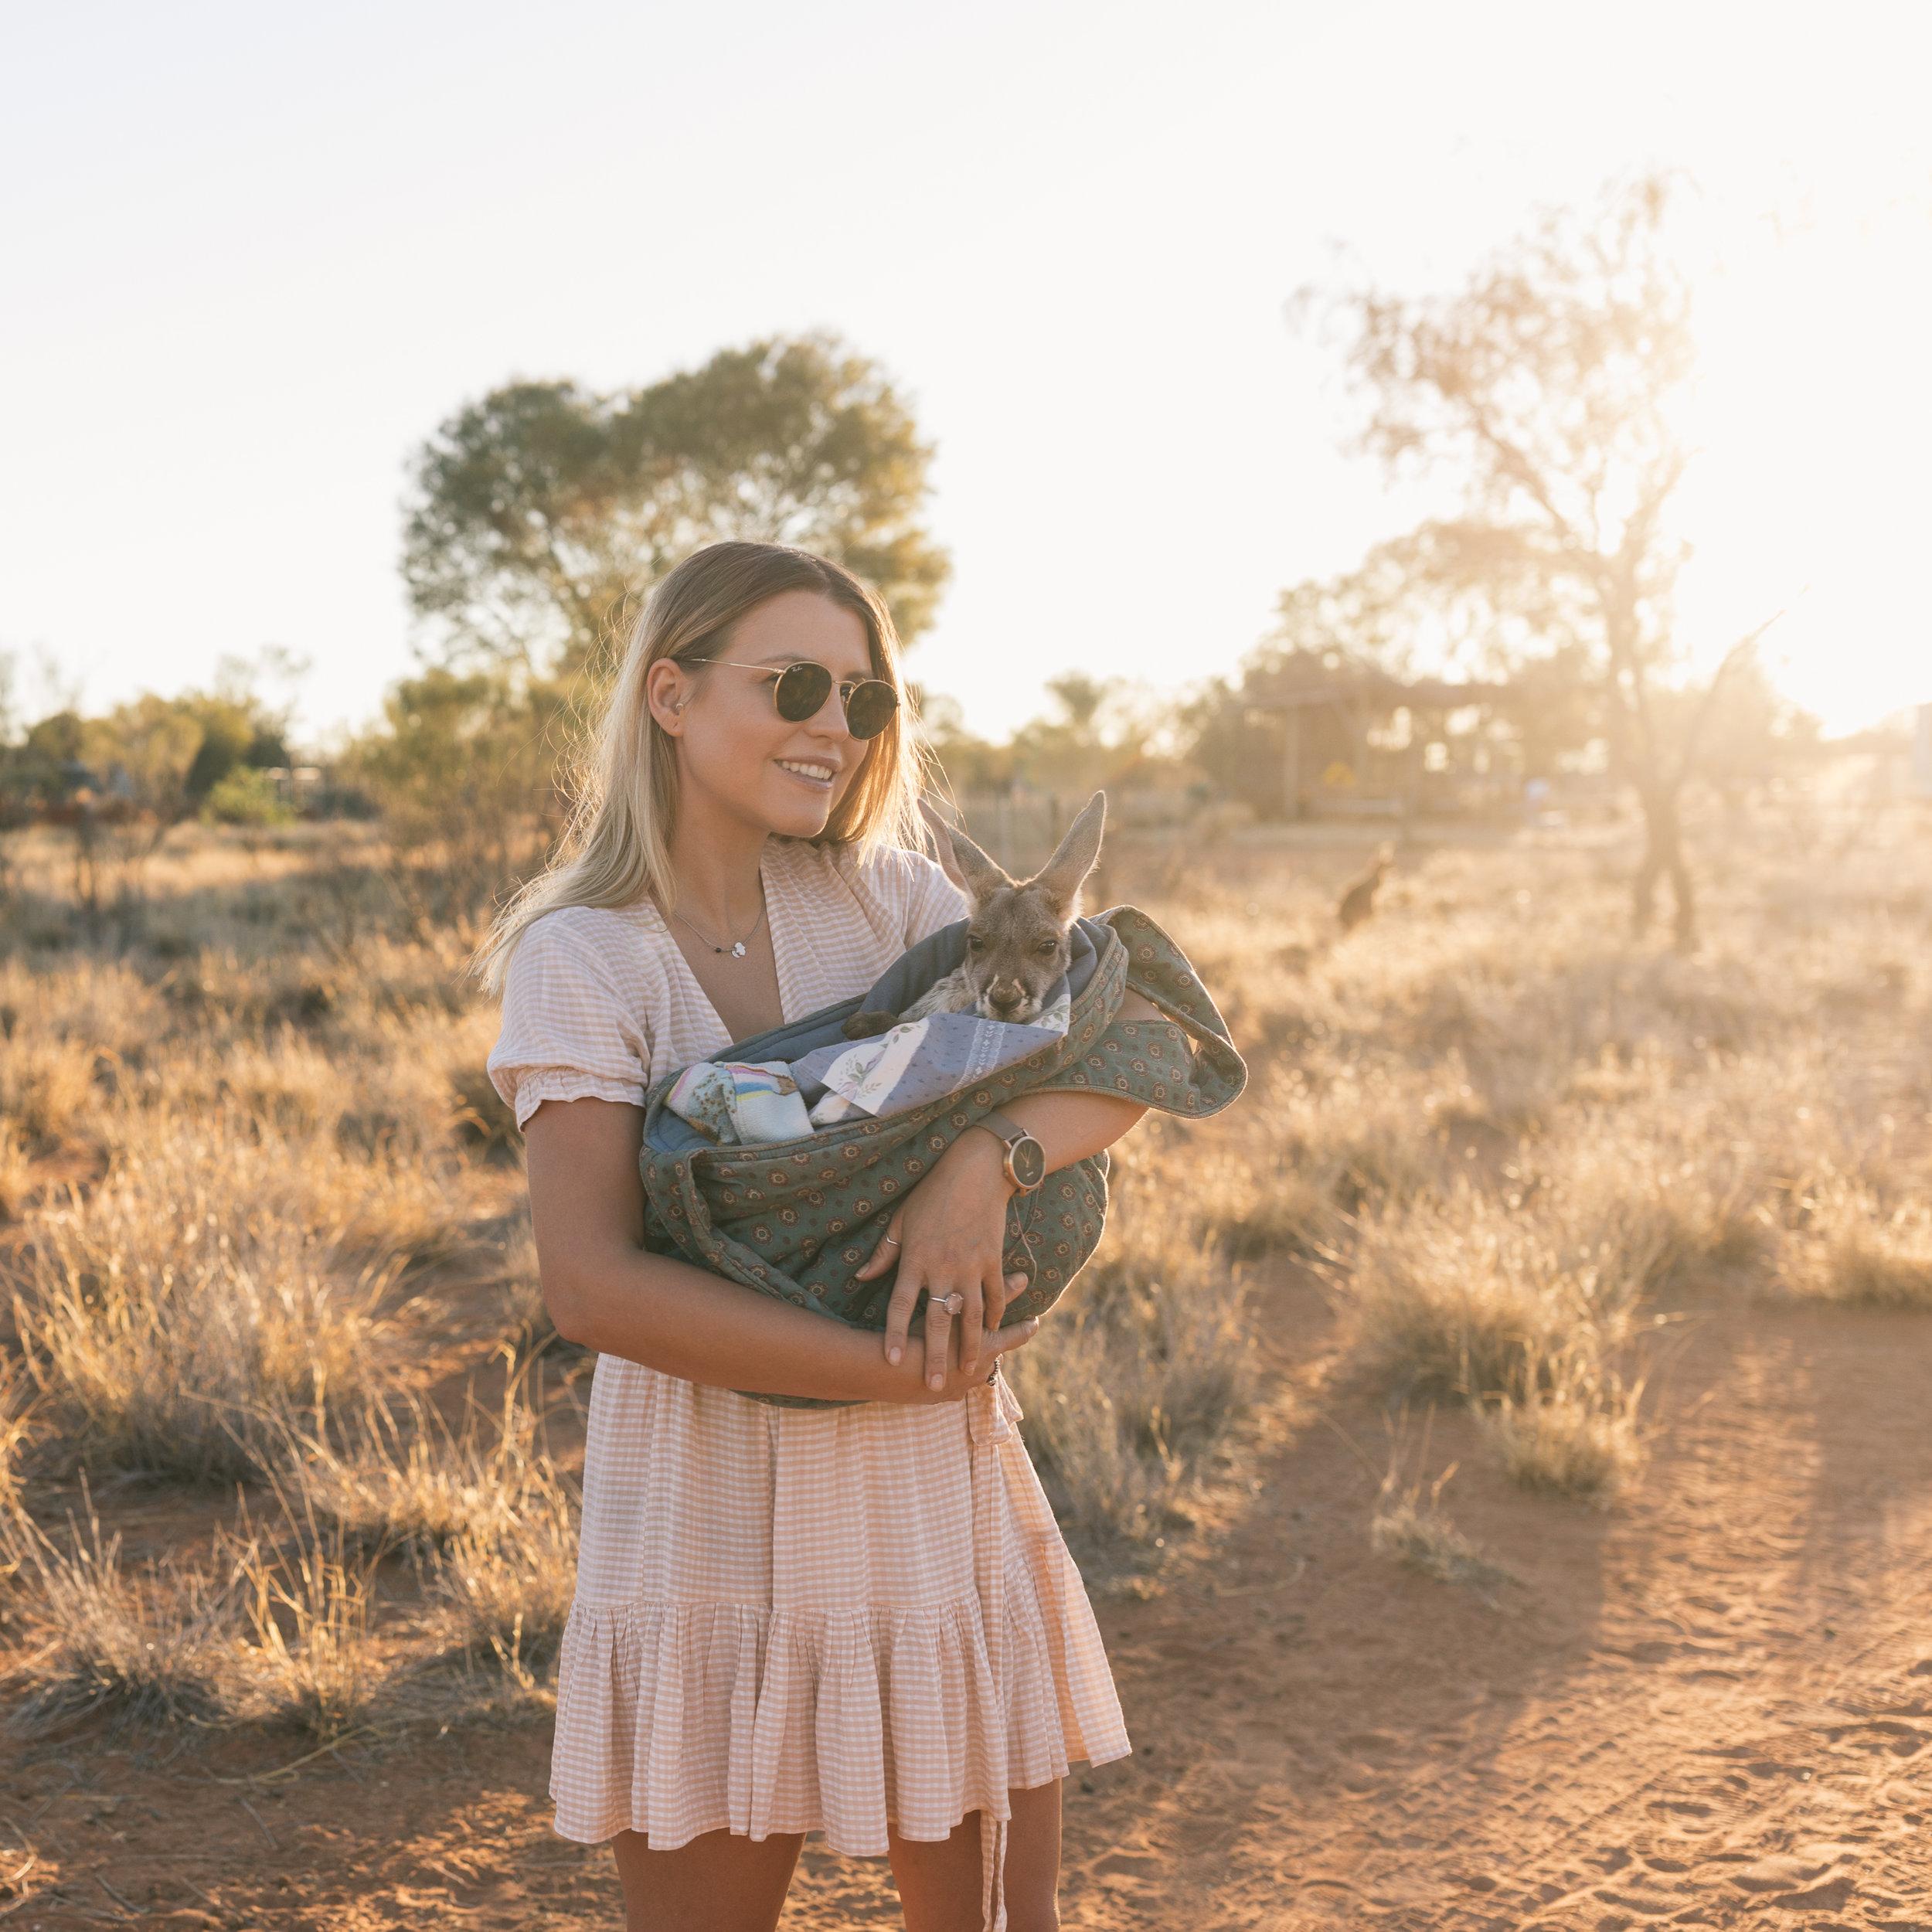 Melissa-Findley-Northern-Territory-Blog-40.jpg